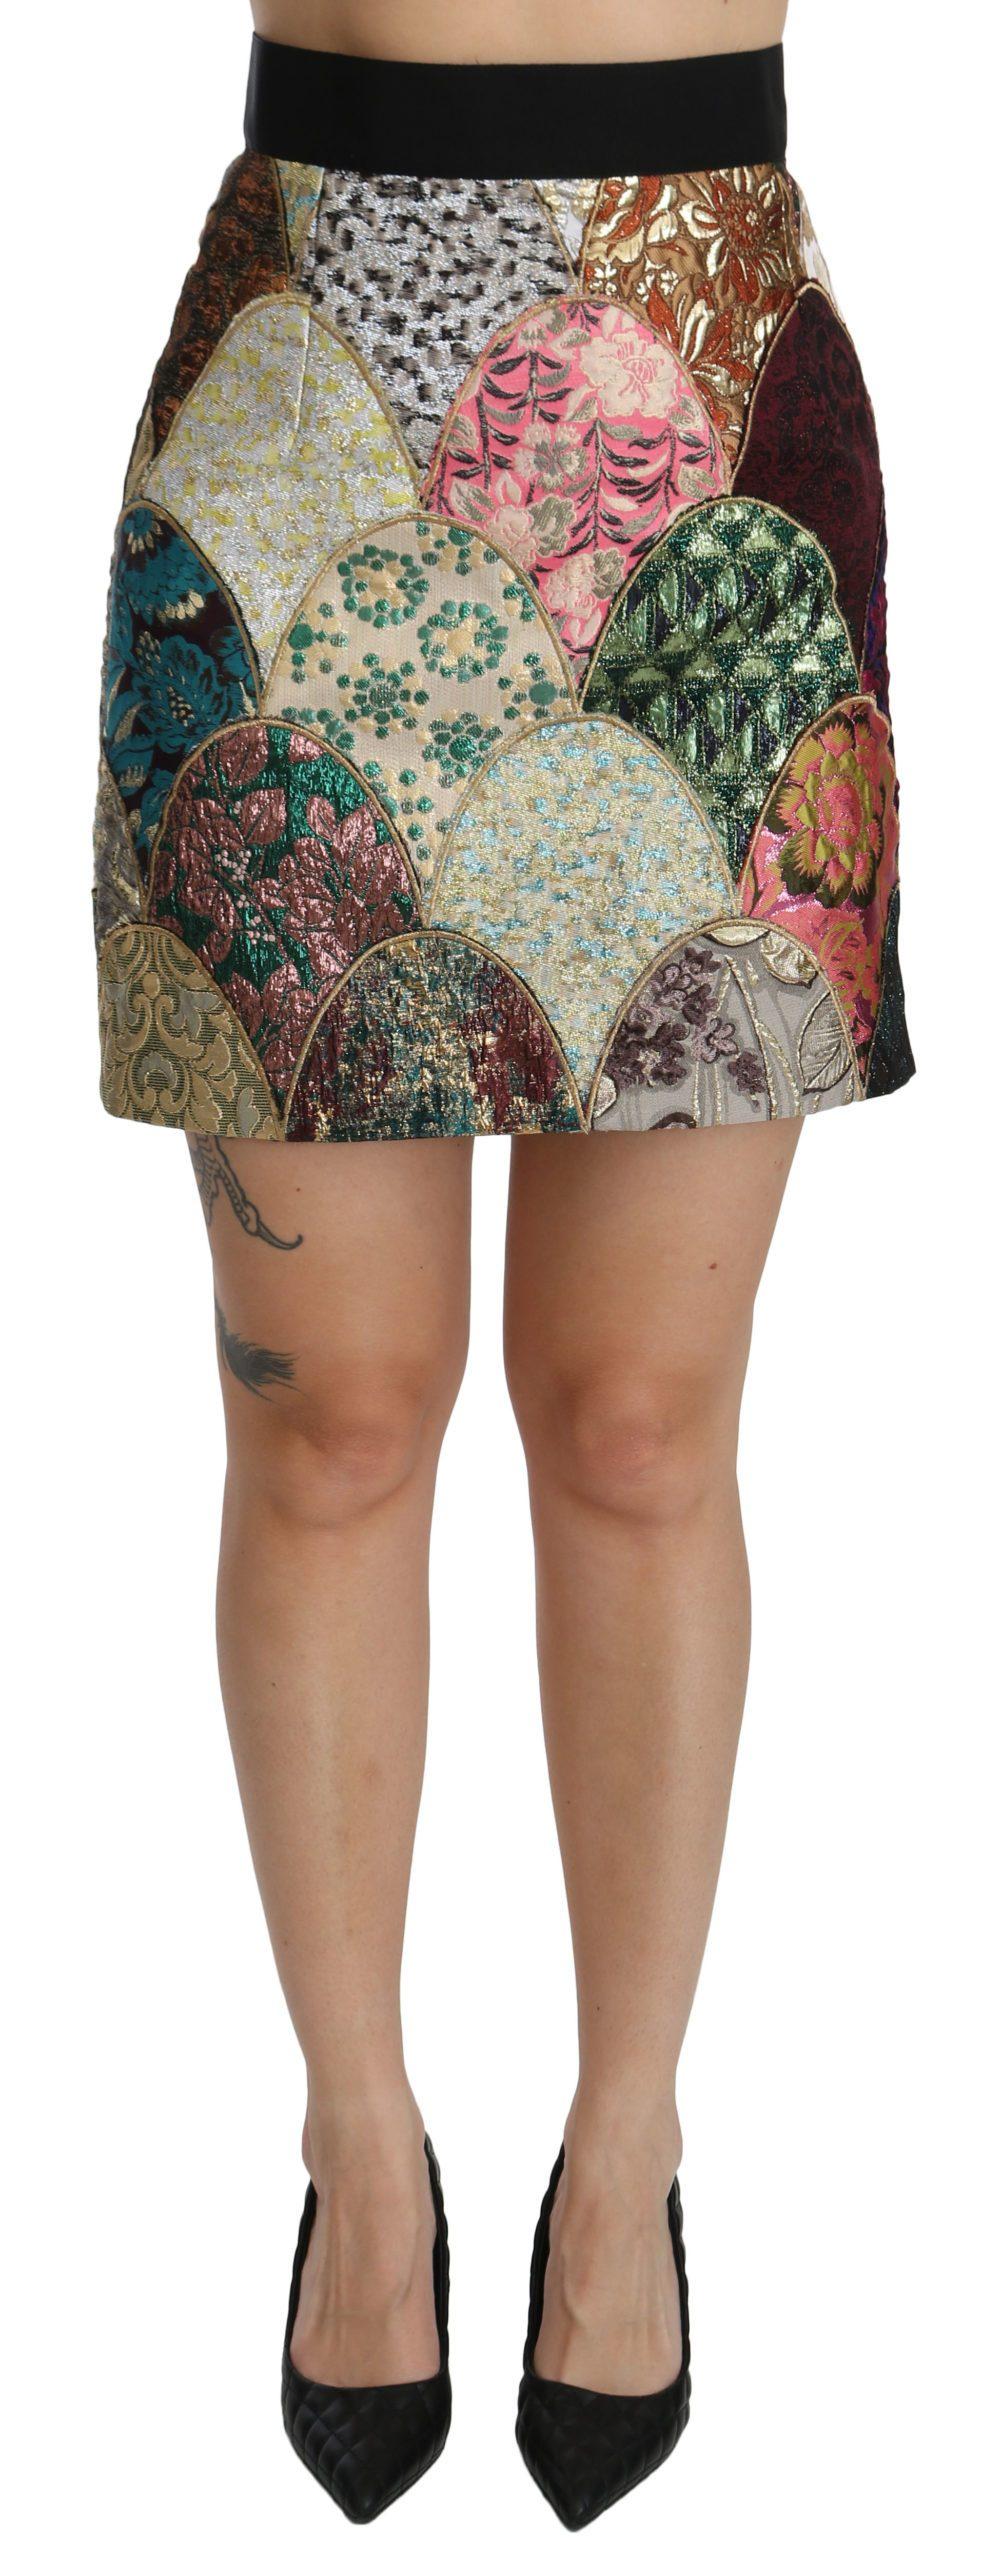 Dolce & Gabbana Women's Jacquard High Waist Mini Skirt Multicolor SKI1361 - IT40|S